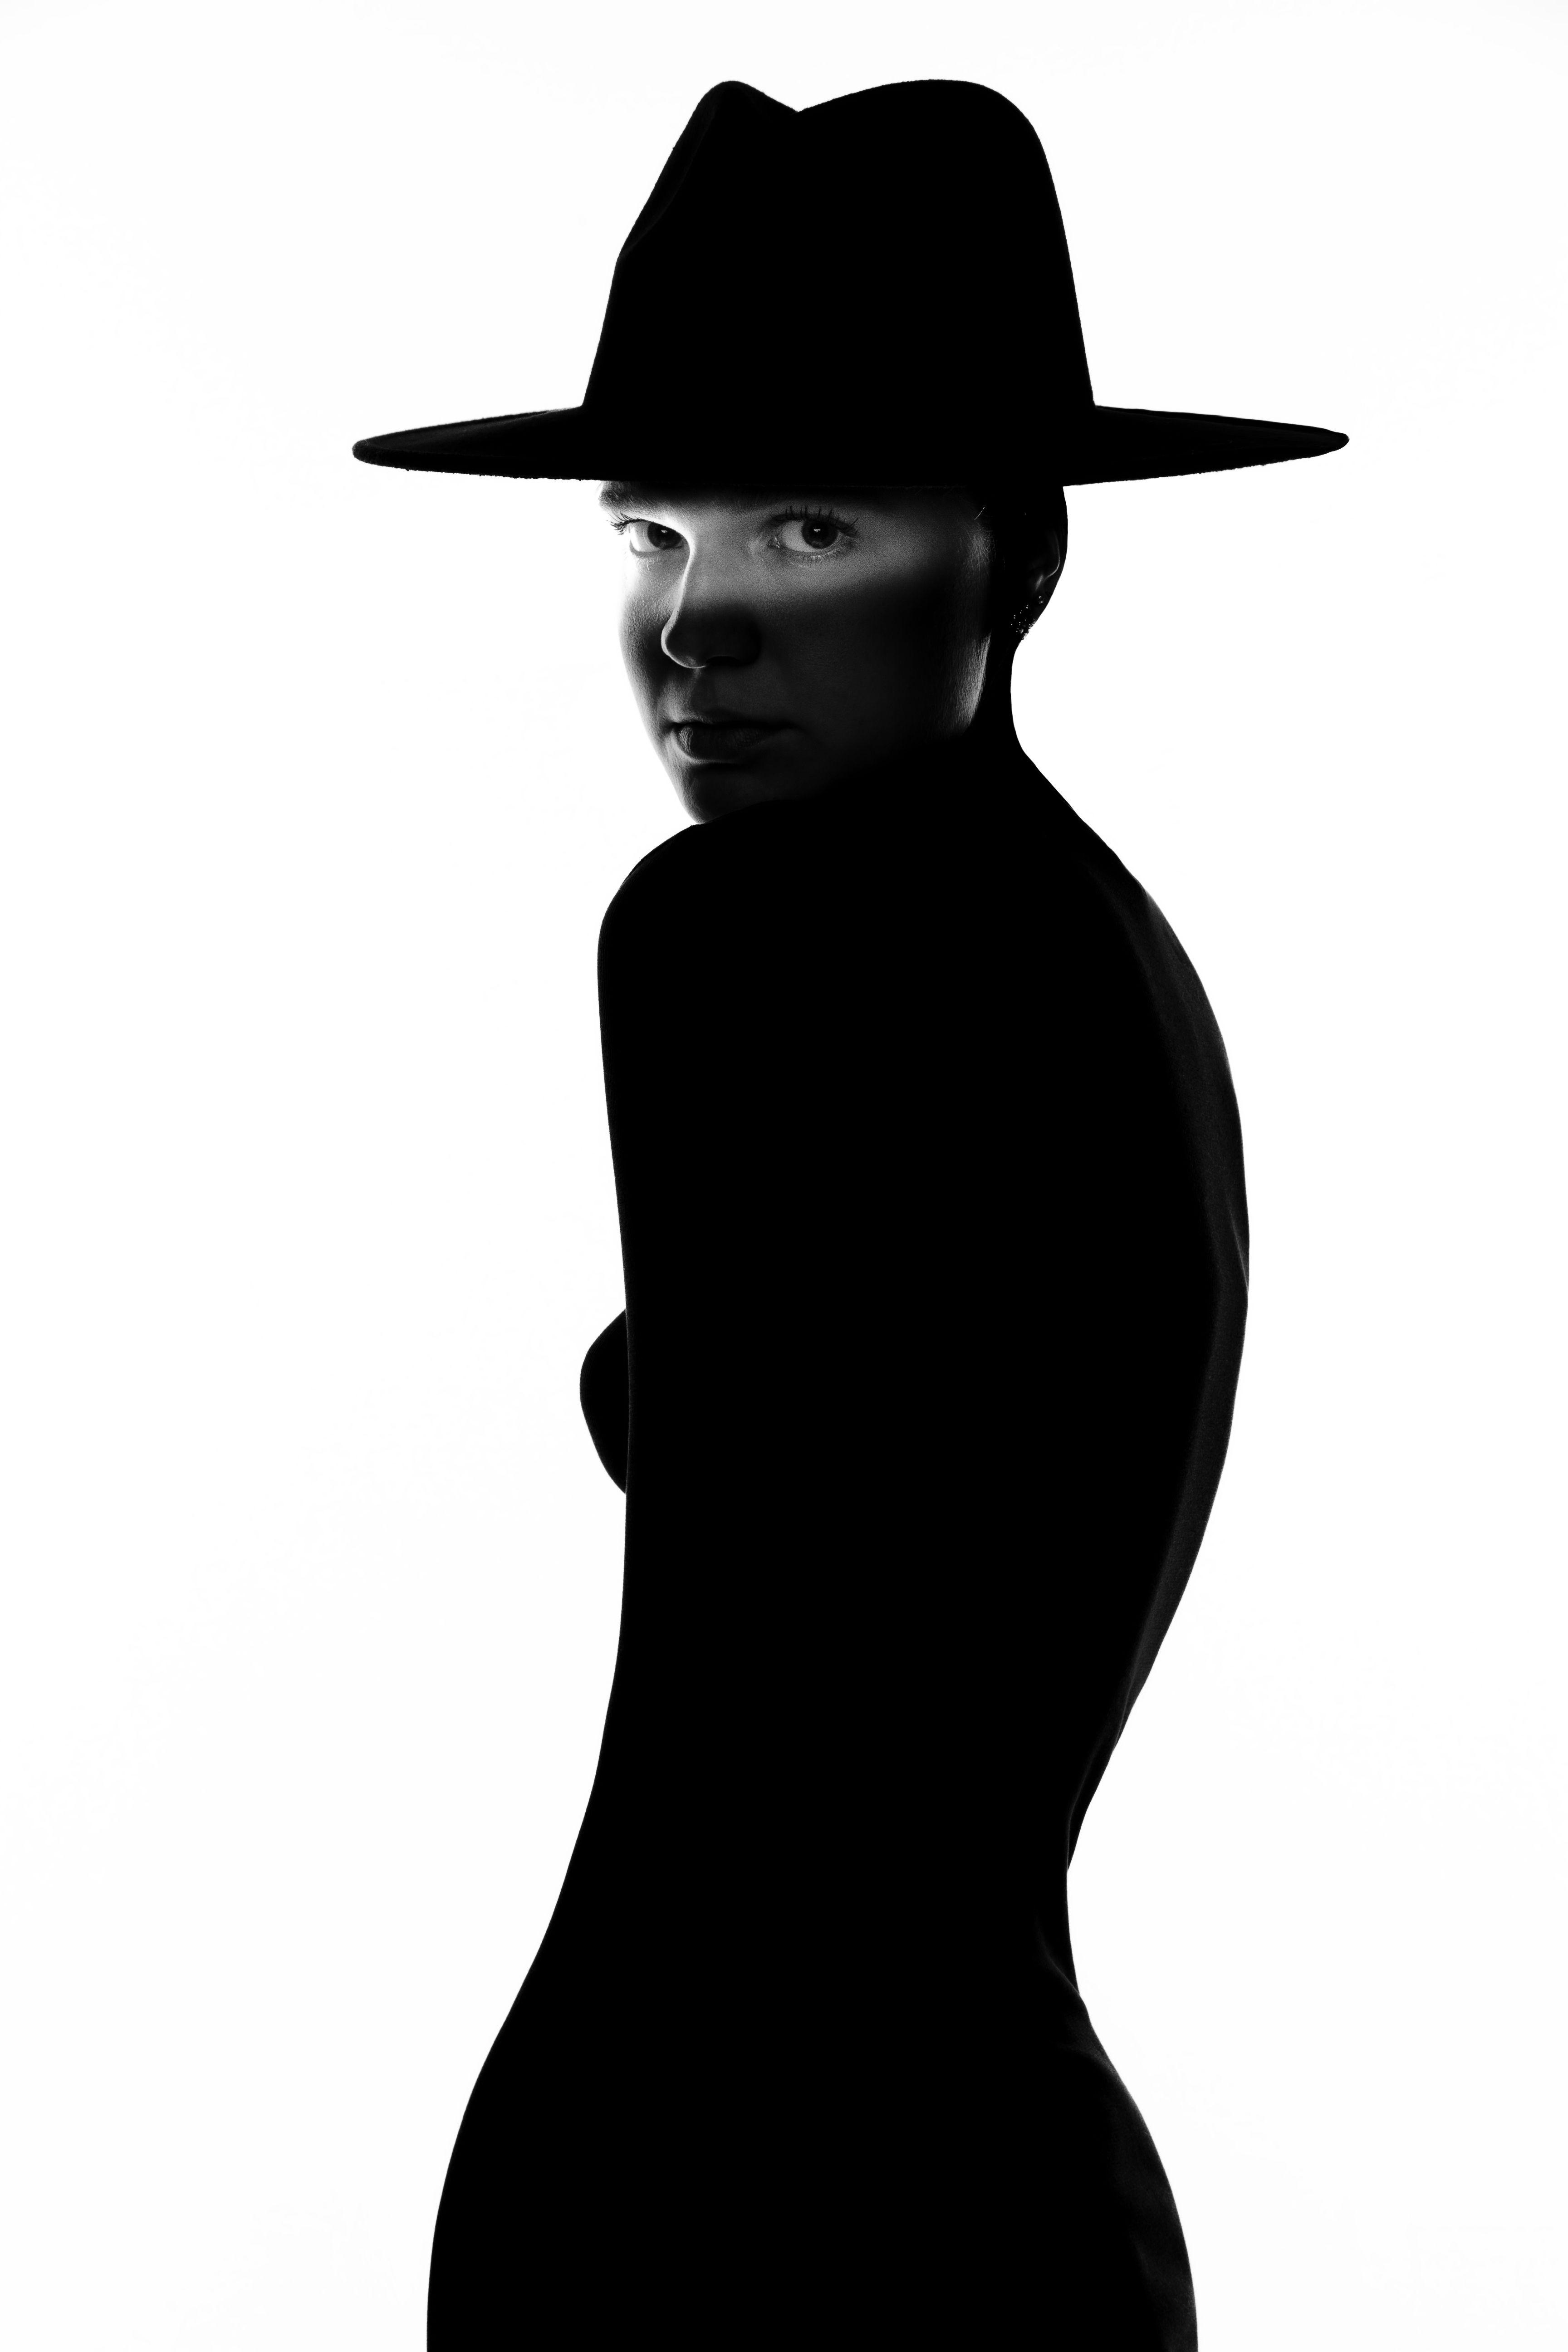 девушка портрет гламур мода фэшн шляпа силуэт, Юдин Сергей